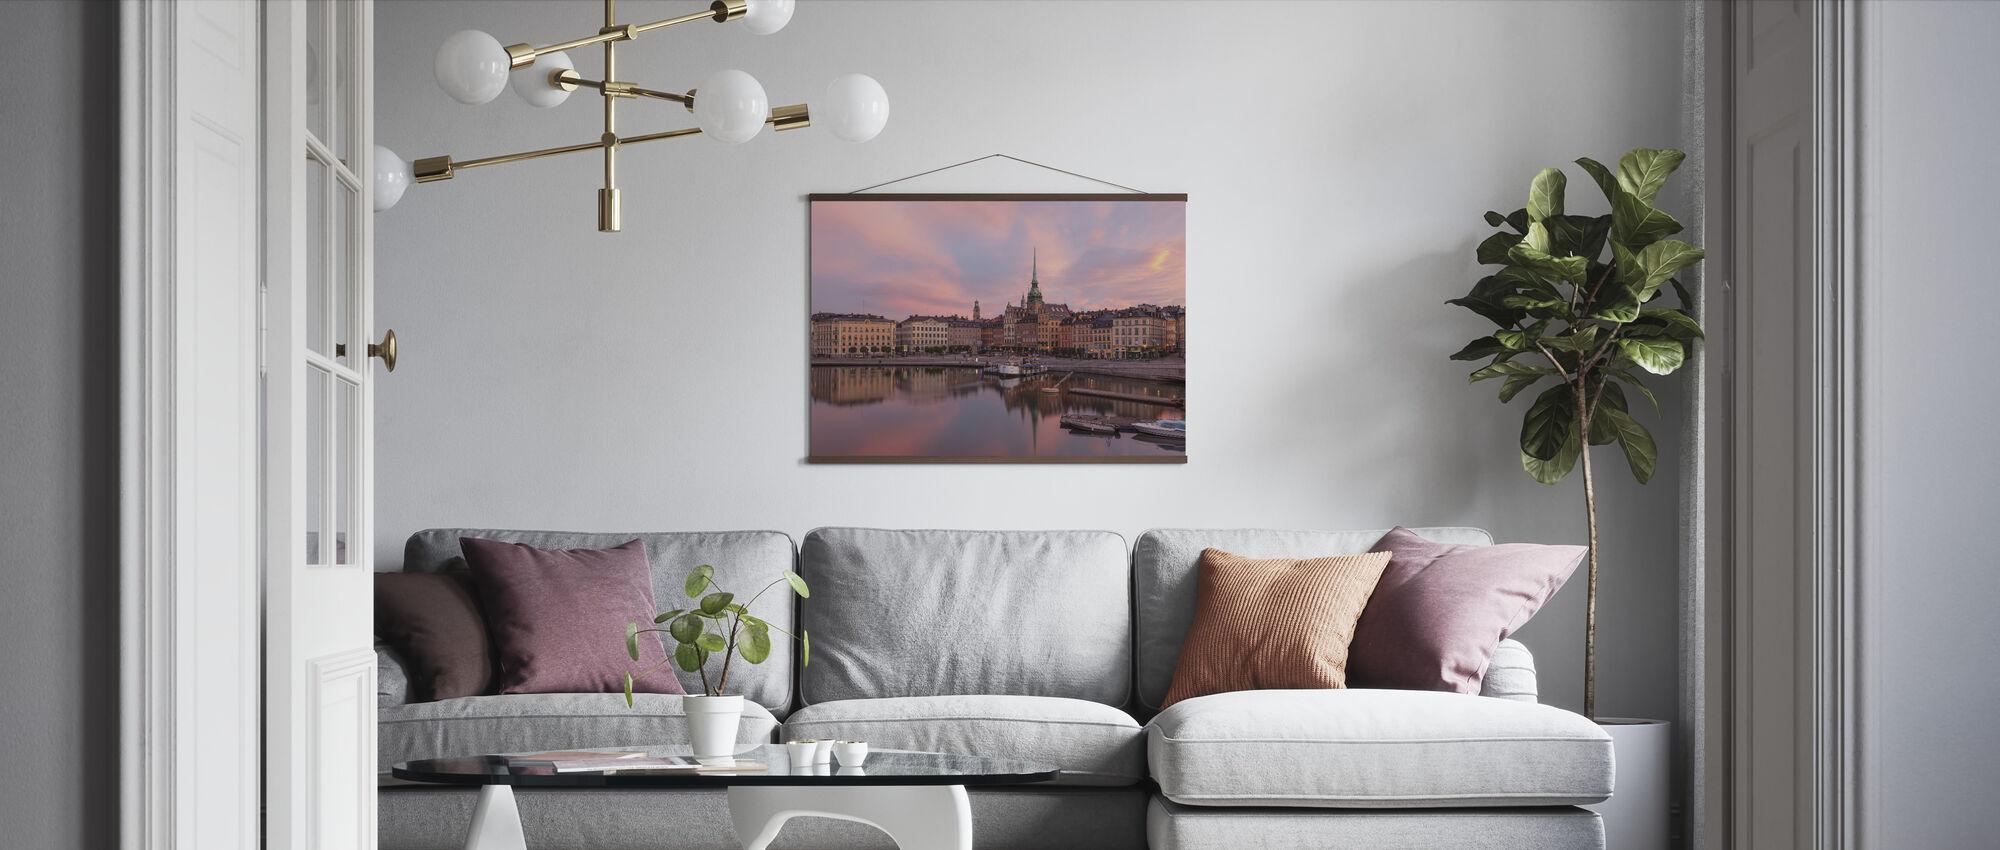 City Between the Bridges - Poster - Living Room